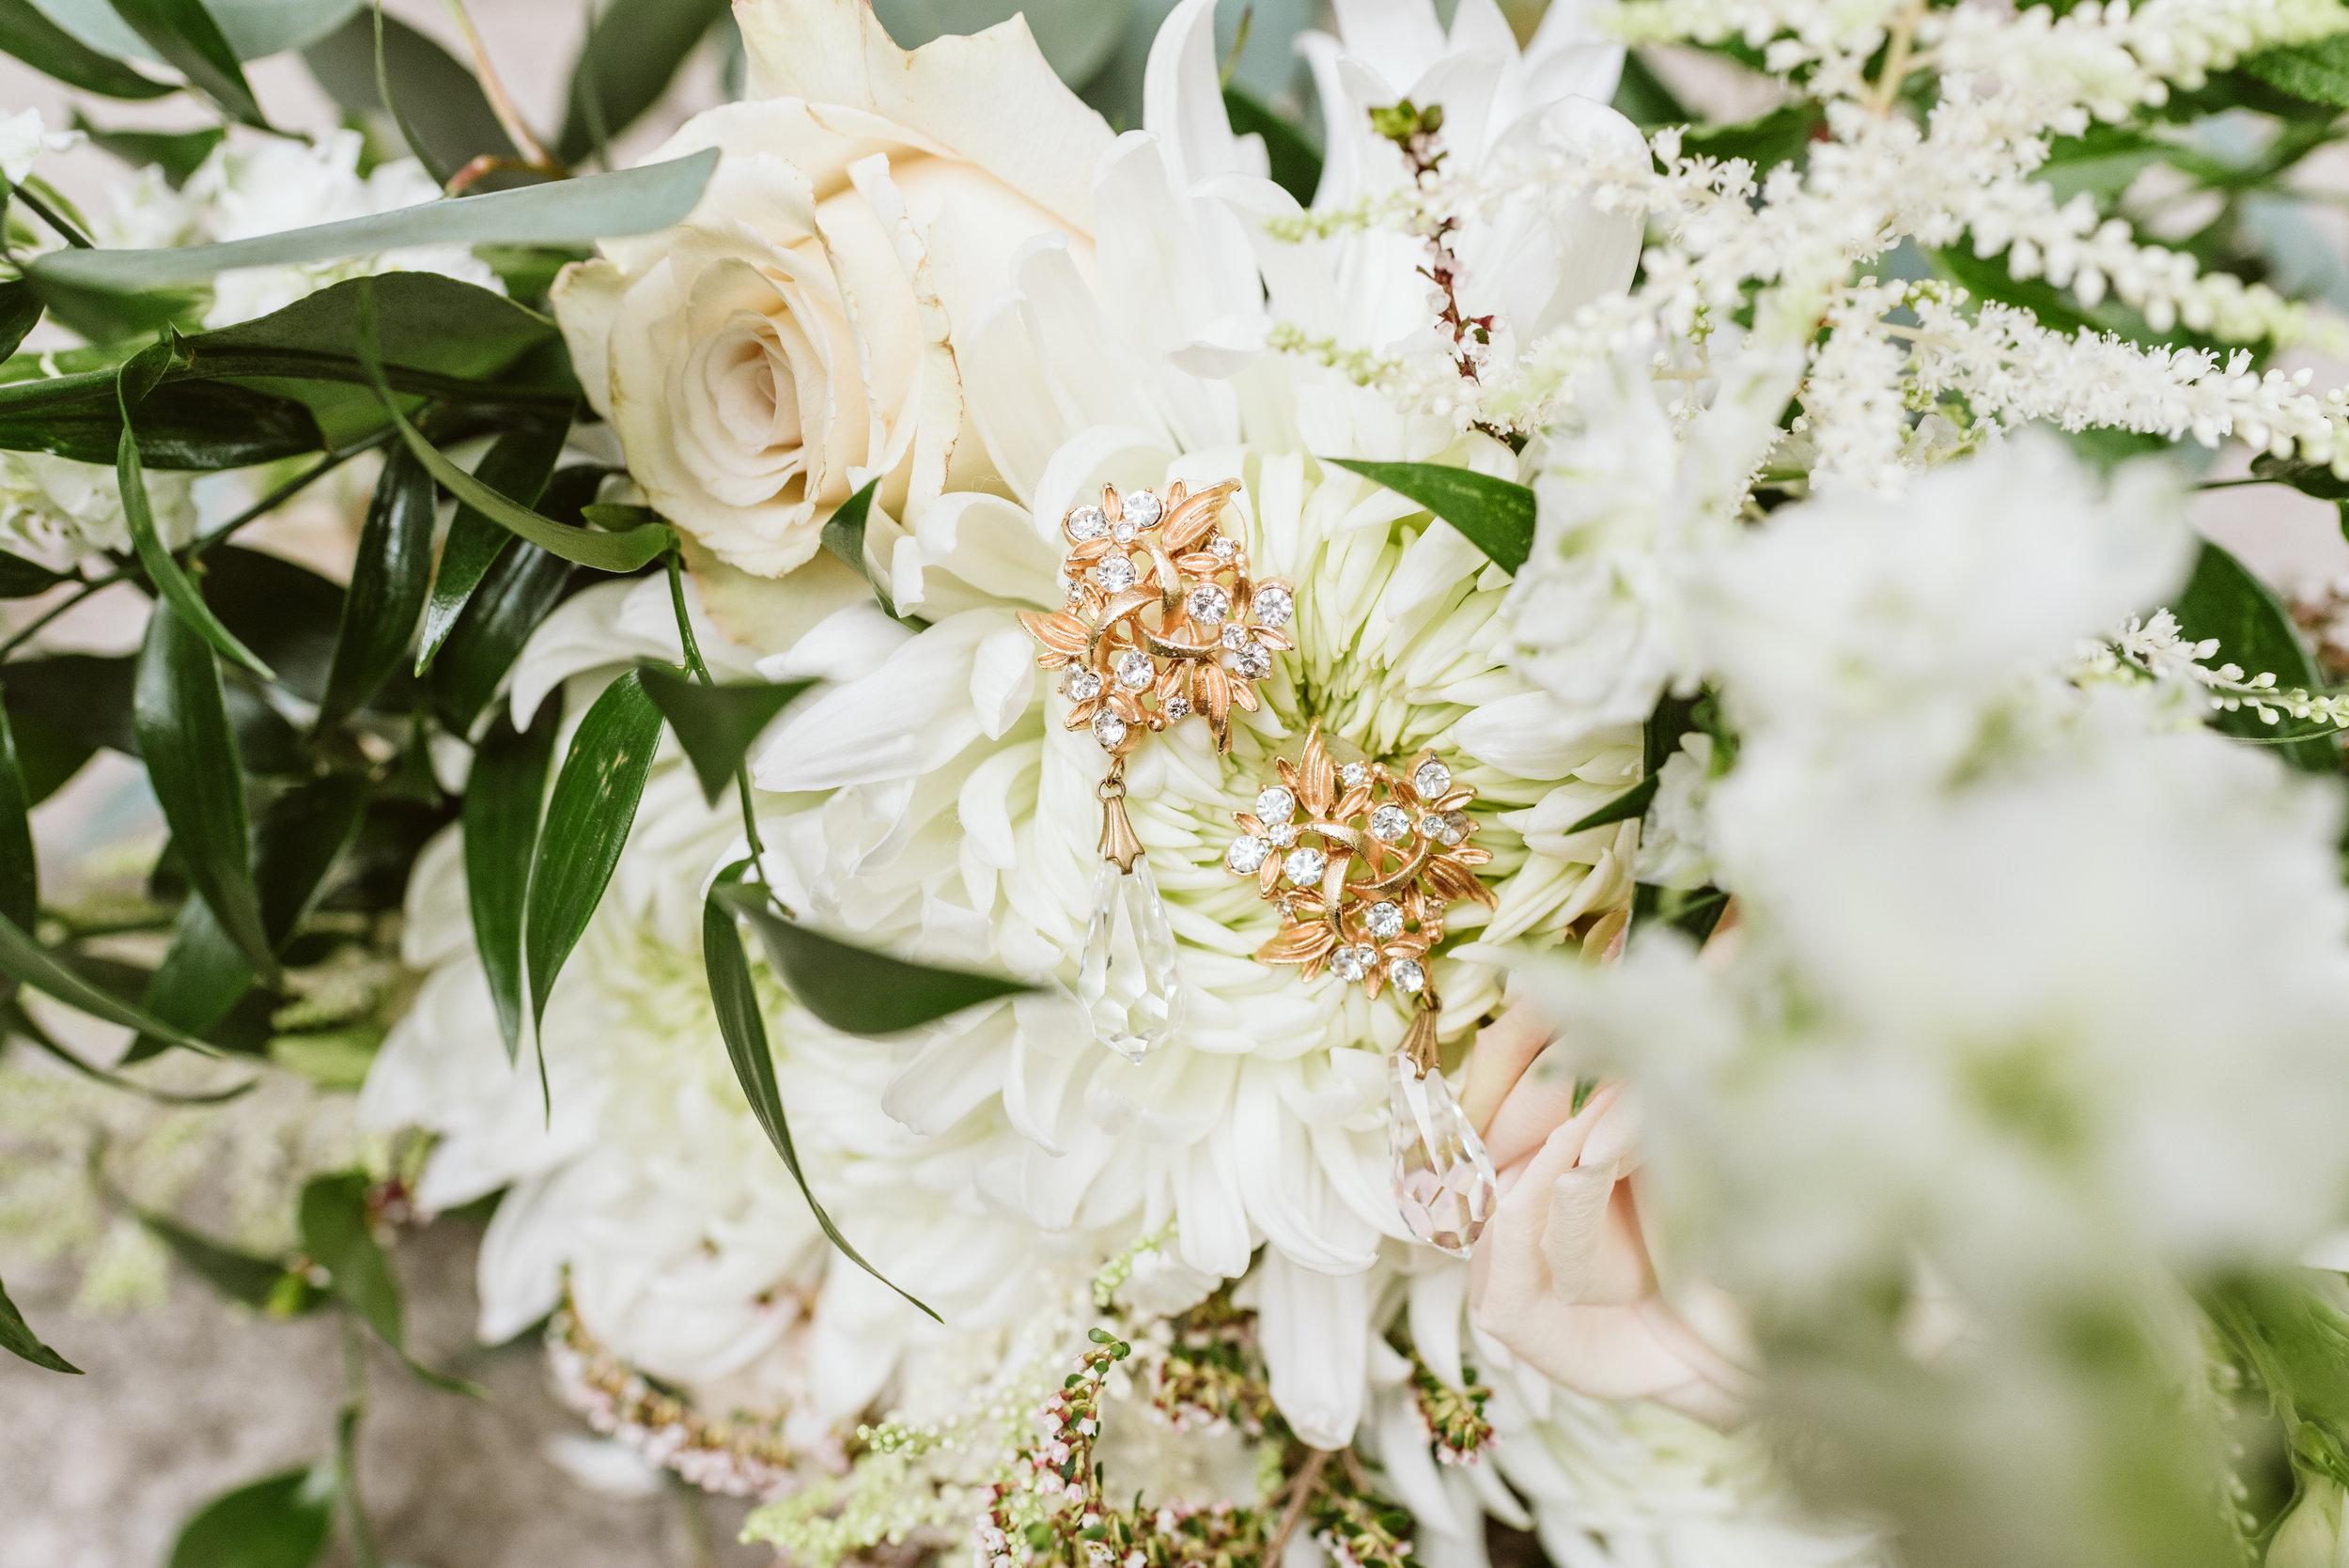 Horticultural_Hall_Lake_Geneva_wedding_Gavyn_Taylor_Photo_021.JPG